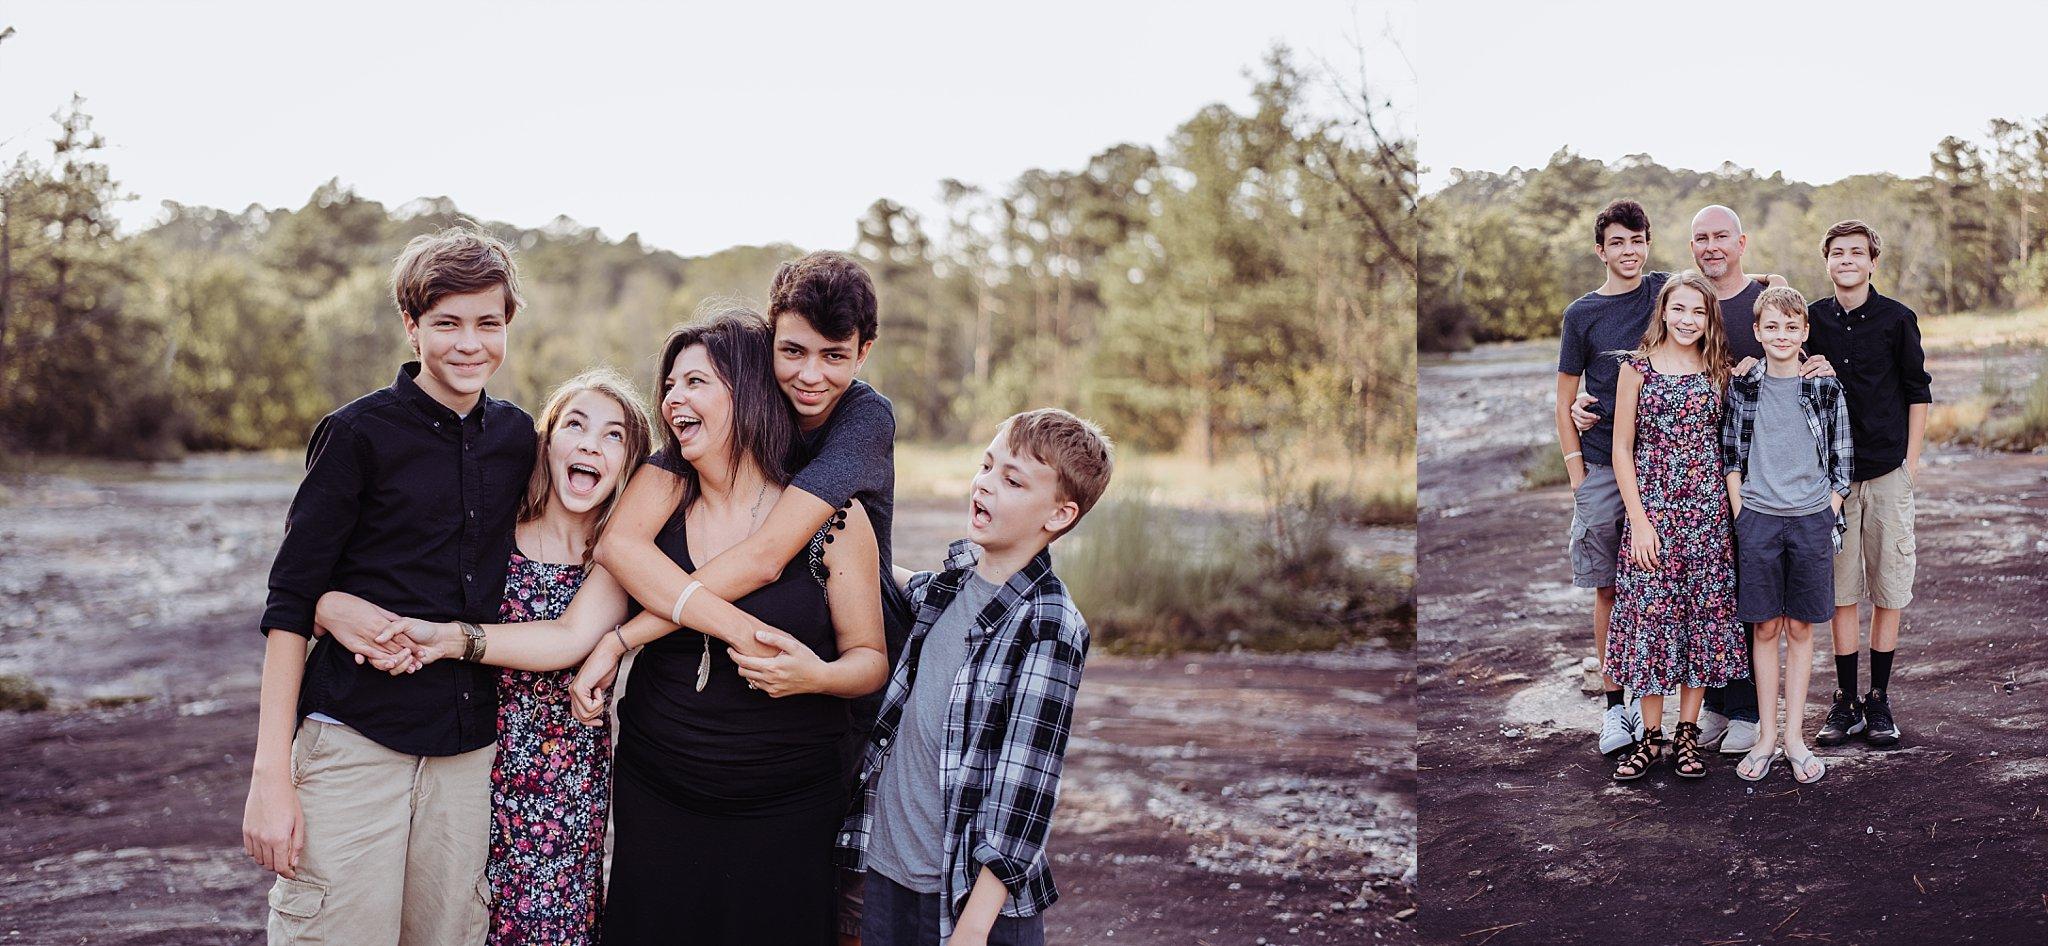 Family of 6 laughing at Arabia Mountain Atlanta GA